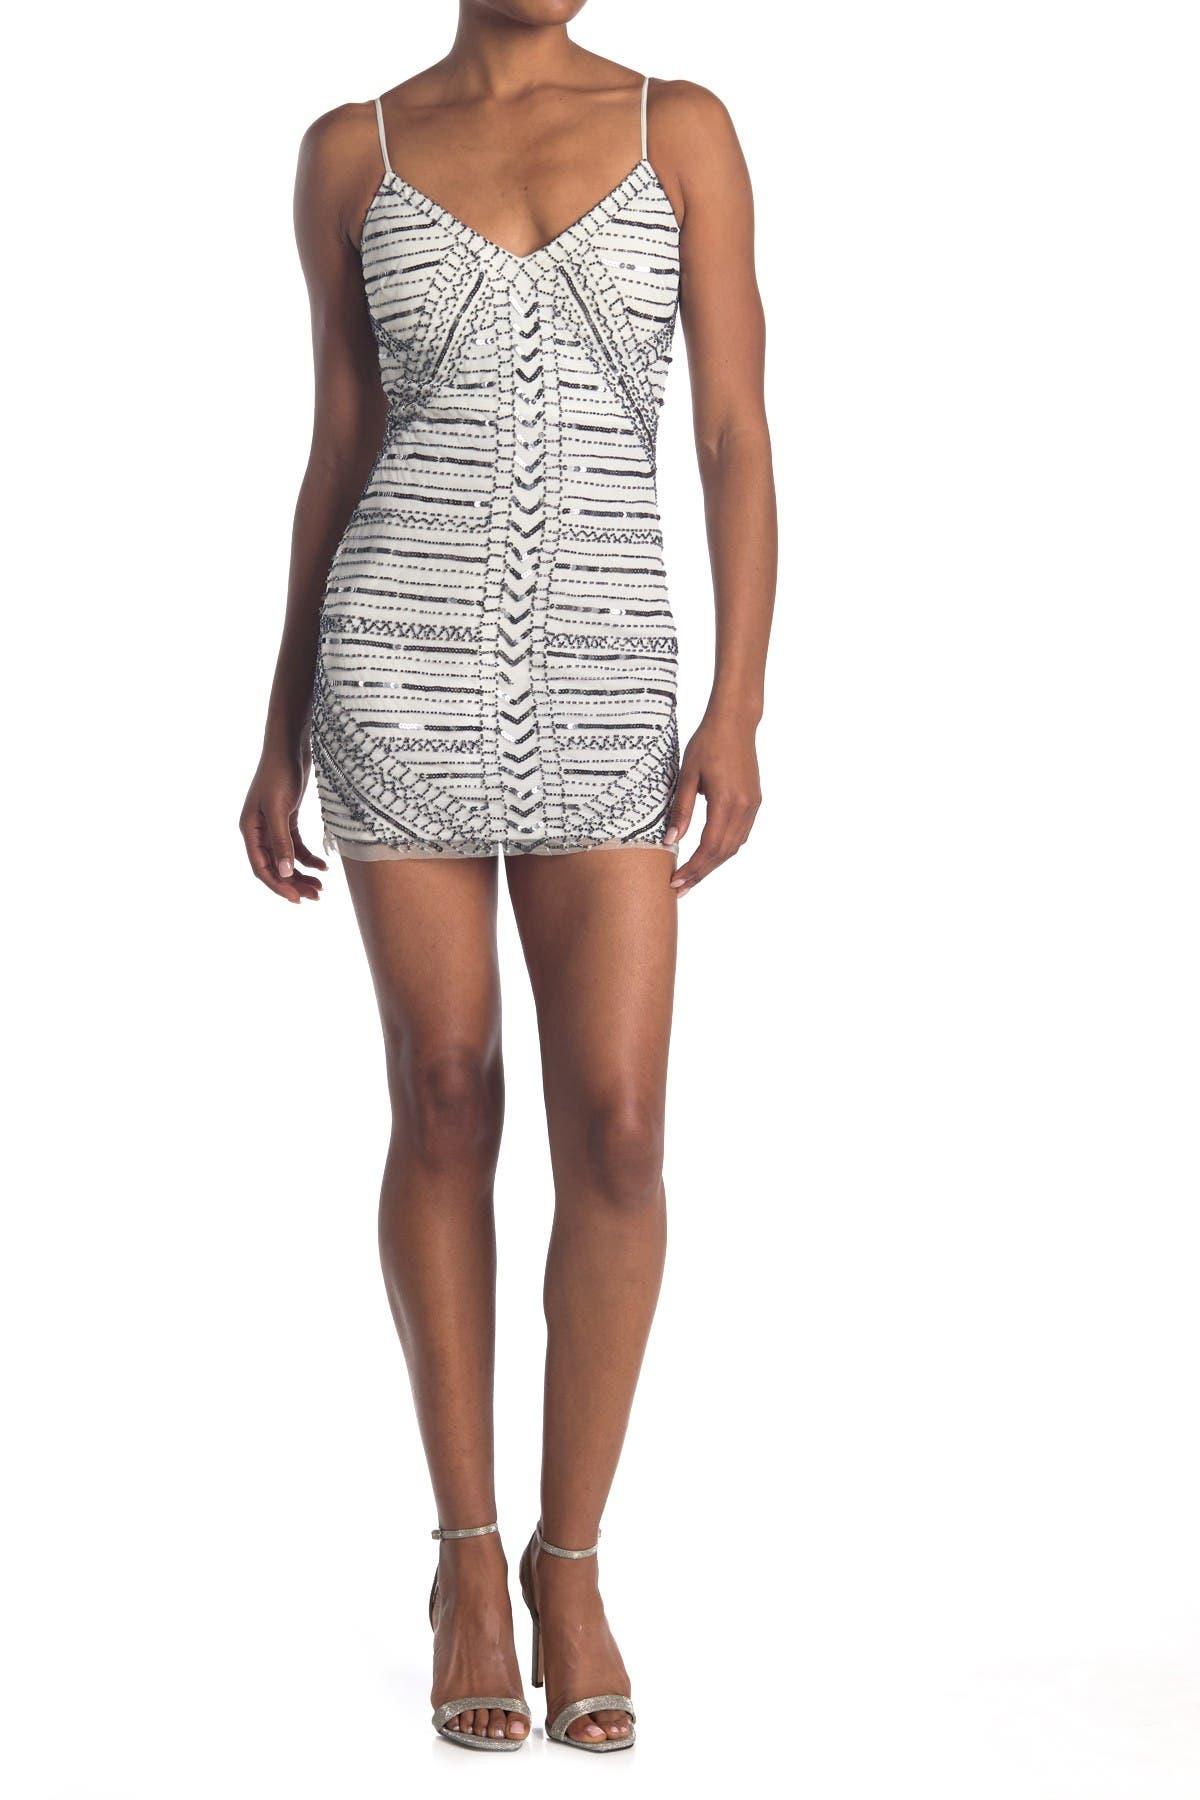 Image of JUMP Geo Sequin Beaded Mini Dress